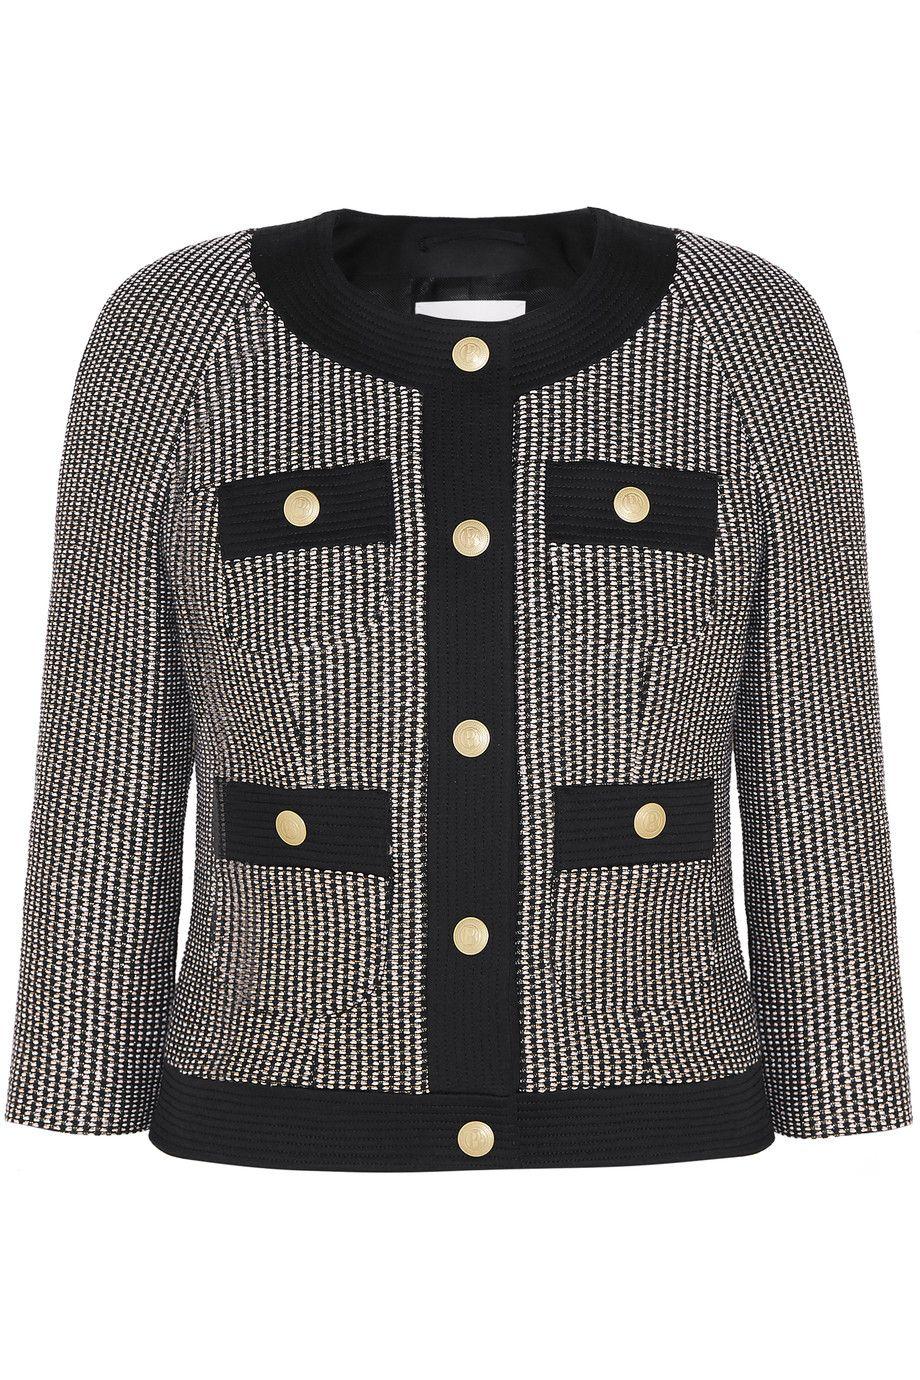 03da6fb5af PIERRE BALMAIN Cotton-blend tweed jacket. #pierrebalmain #cloth #jacket